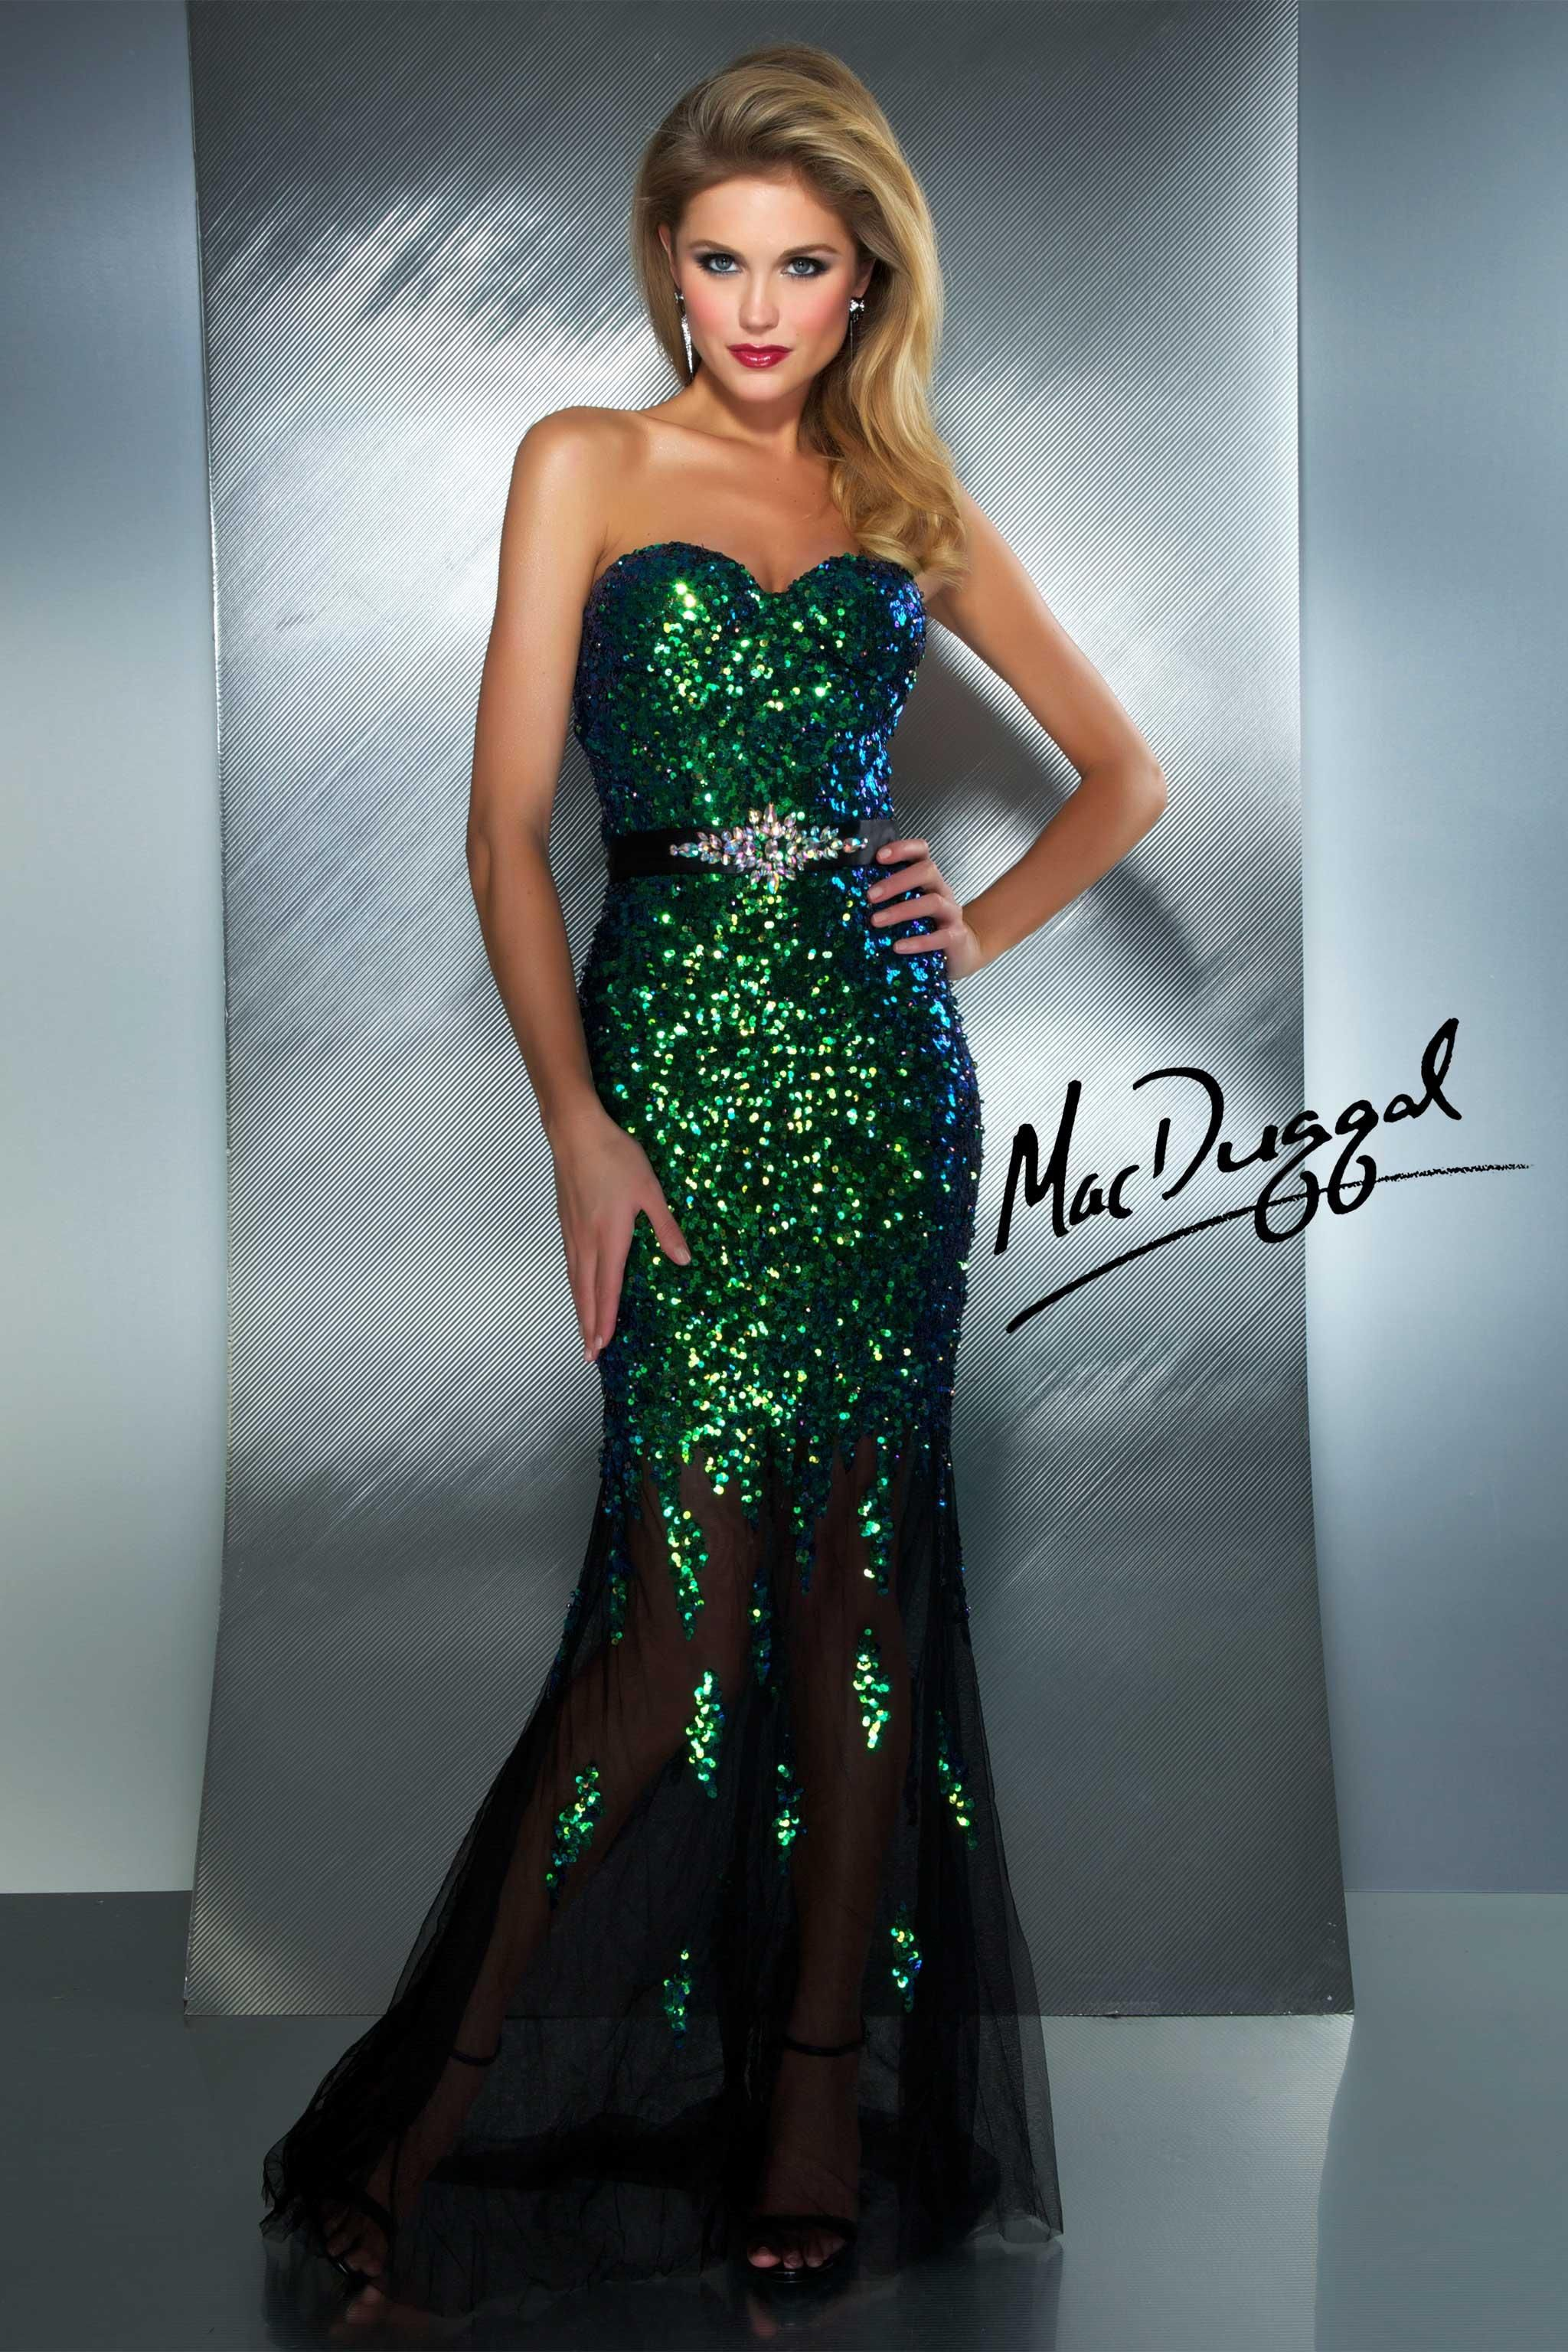 e9f3dfde91a Strapless Peacock Sequin Gown